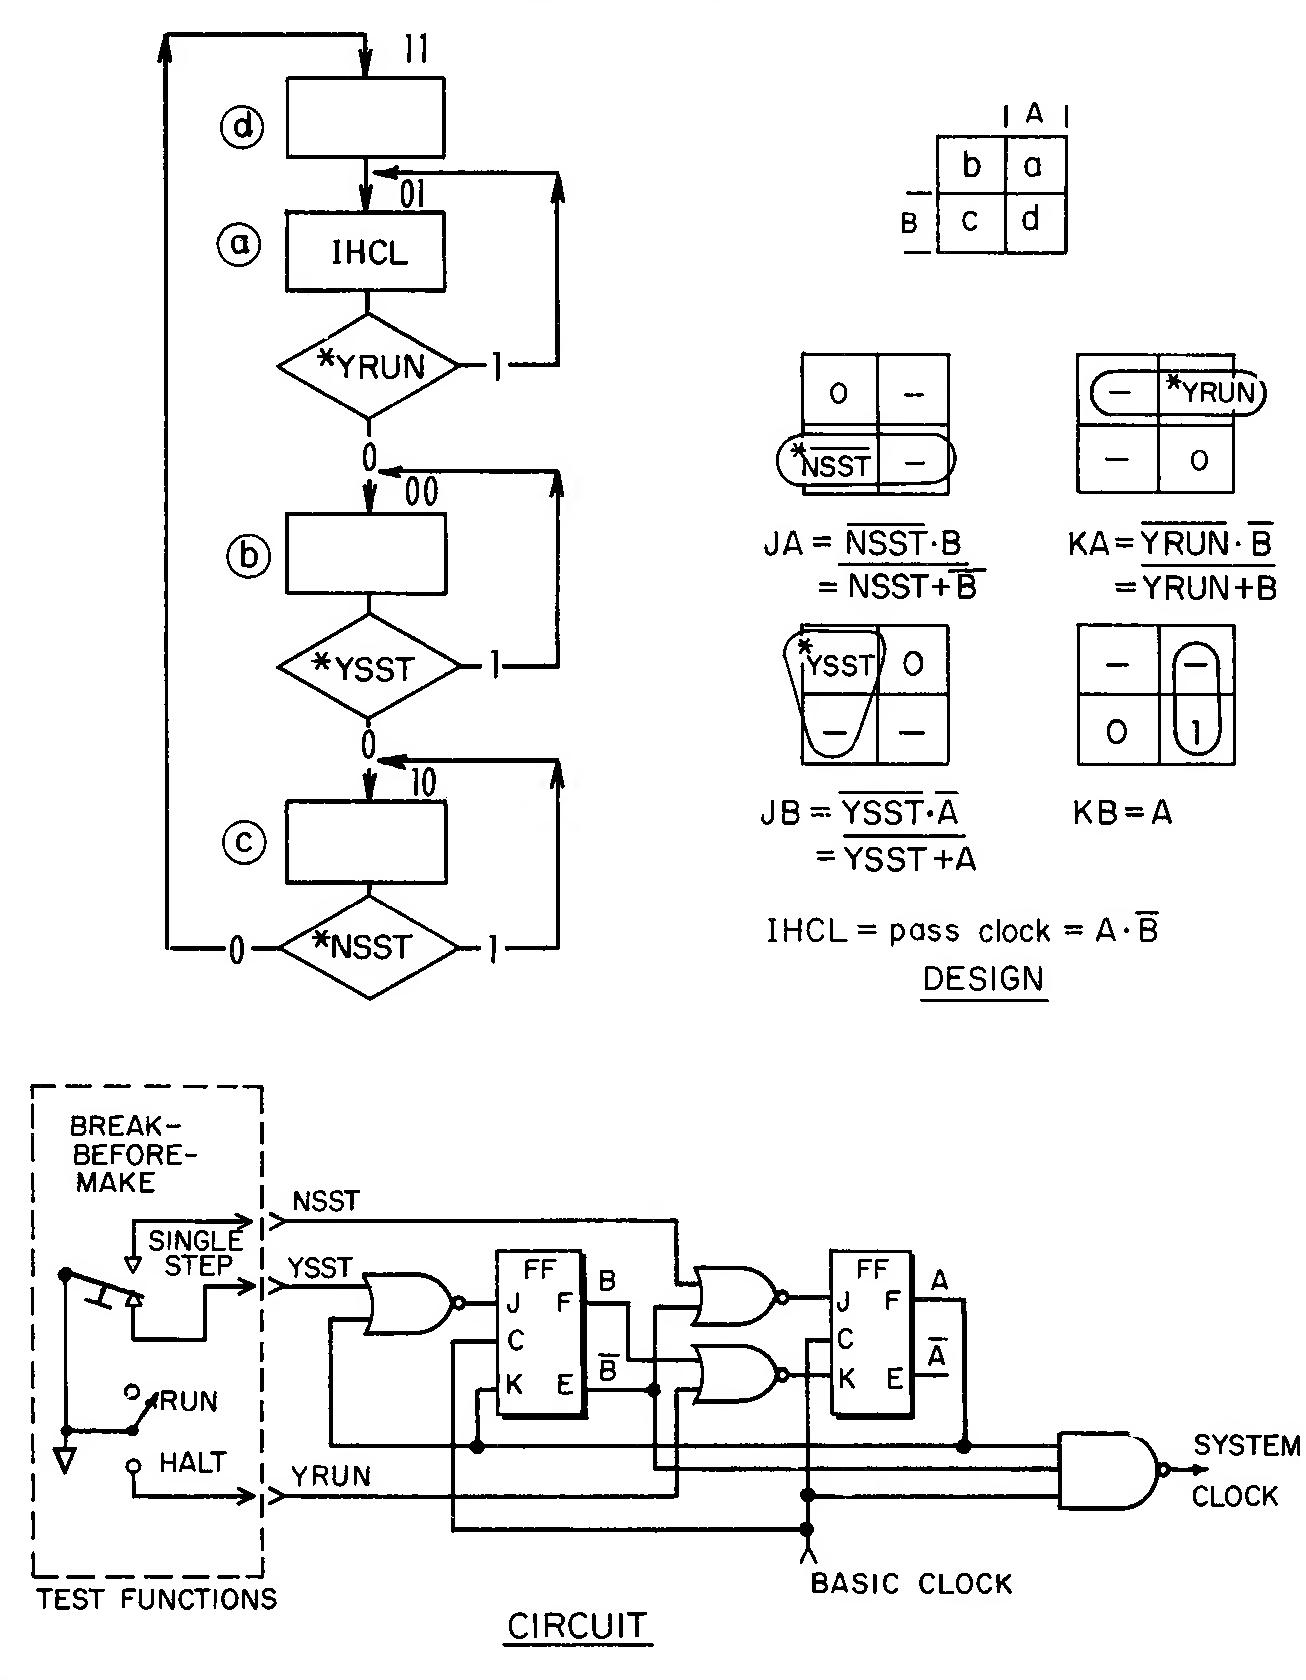 figure 7.5